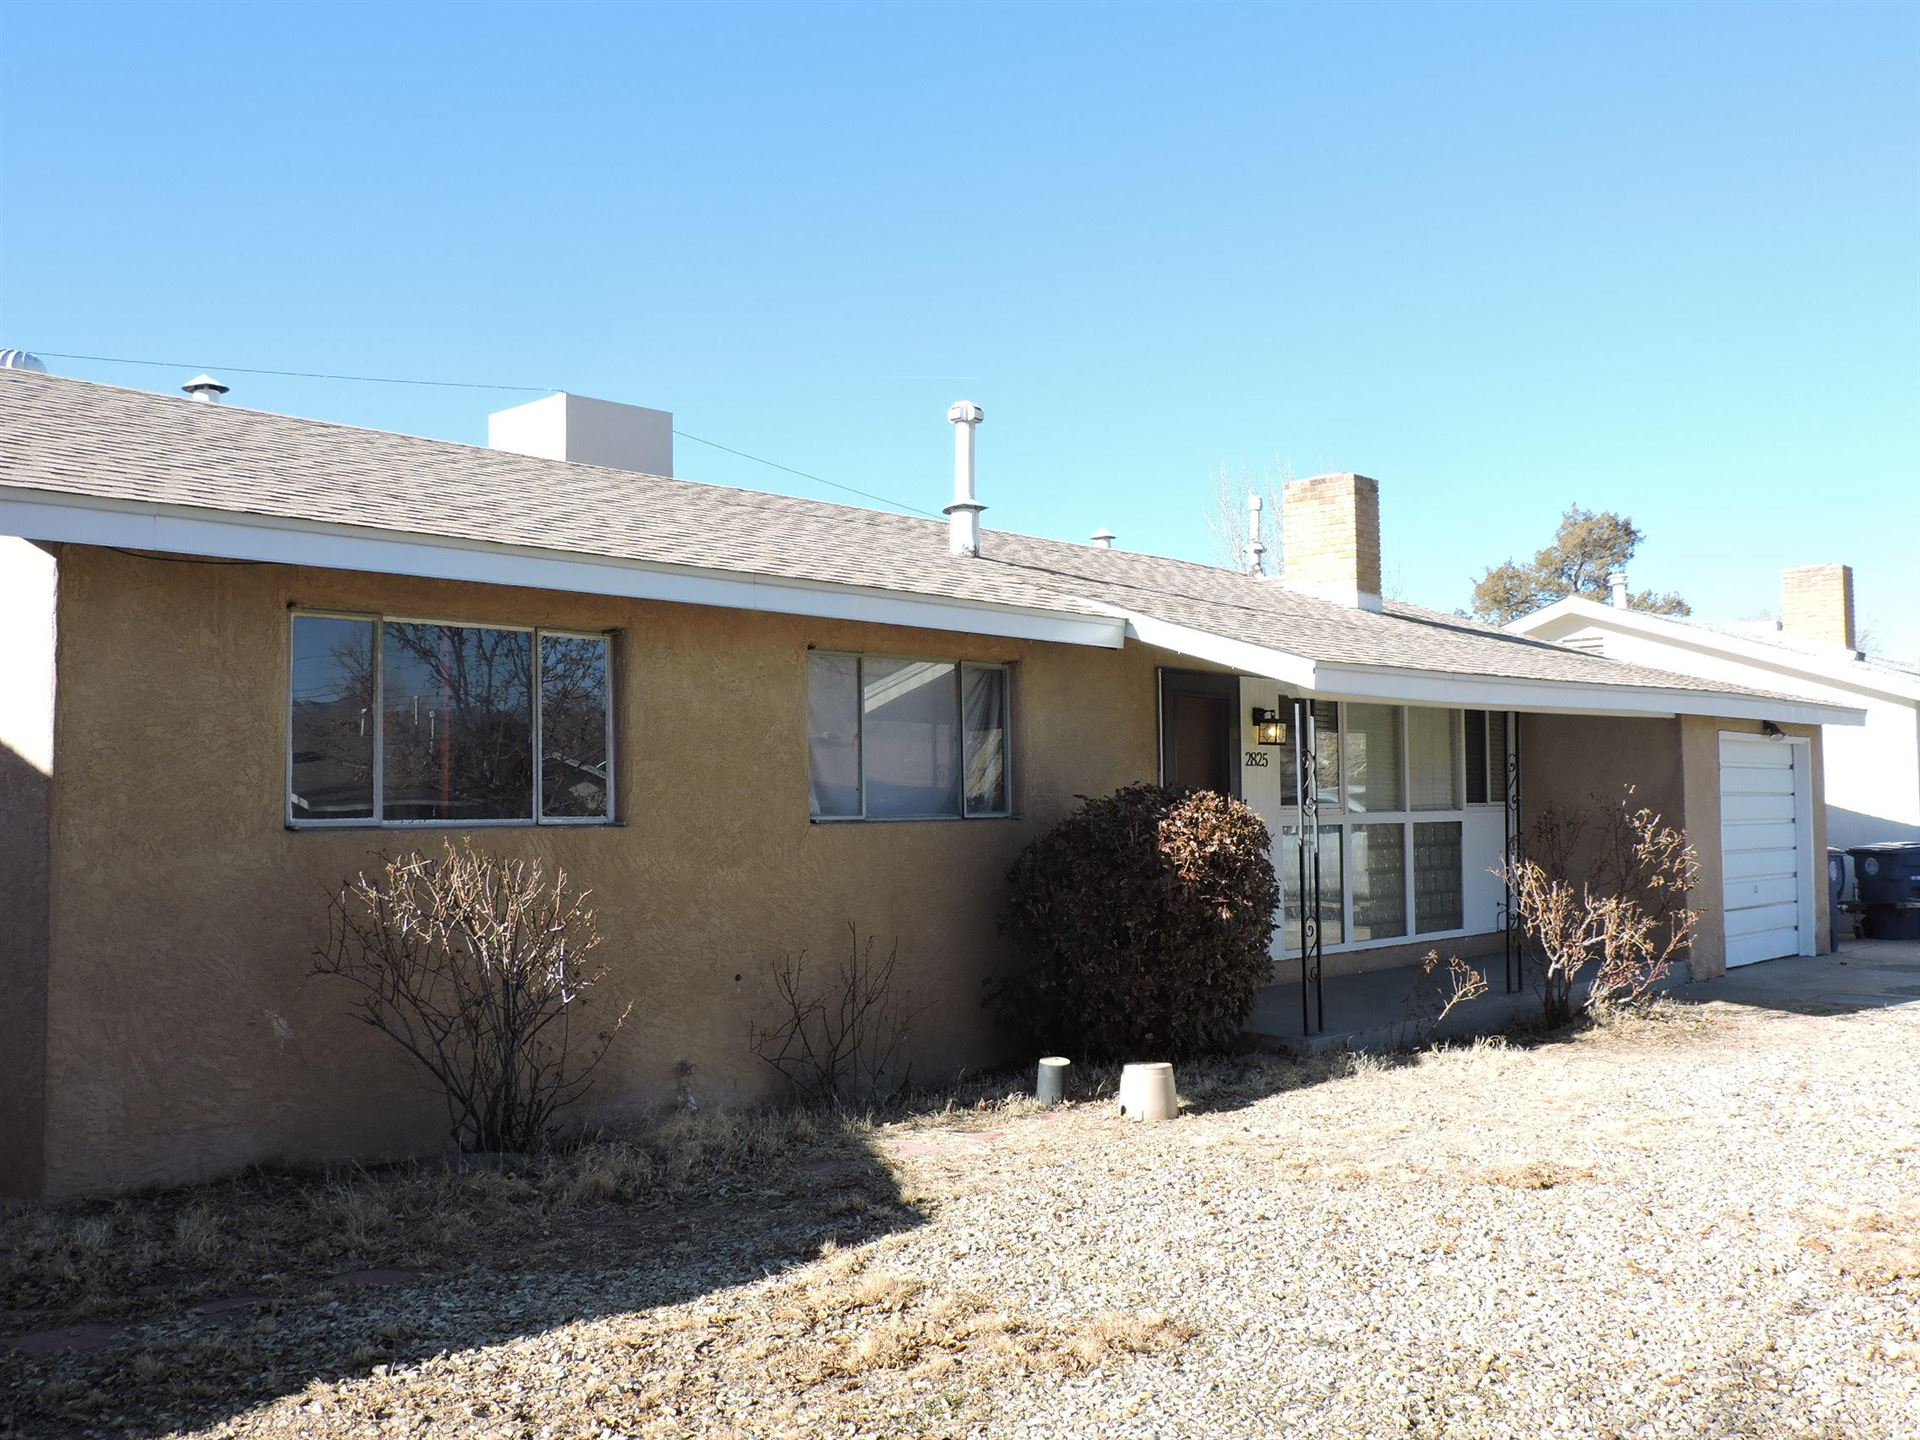 2825 LA VETA Drive NE, Albuquerque, NM 87110 - MLS#: 983790